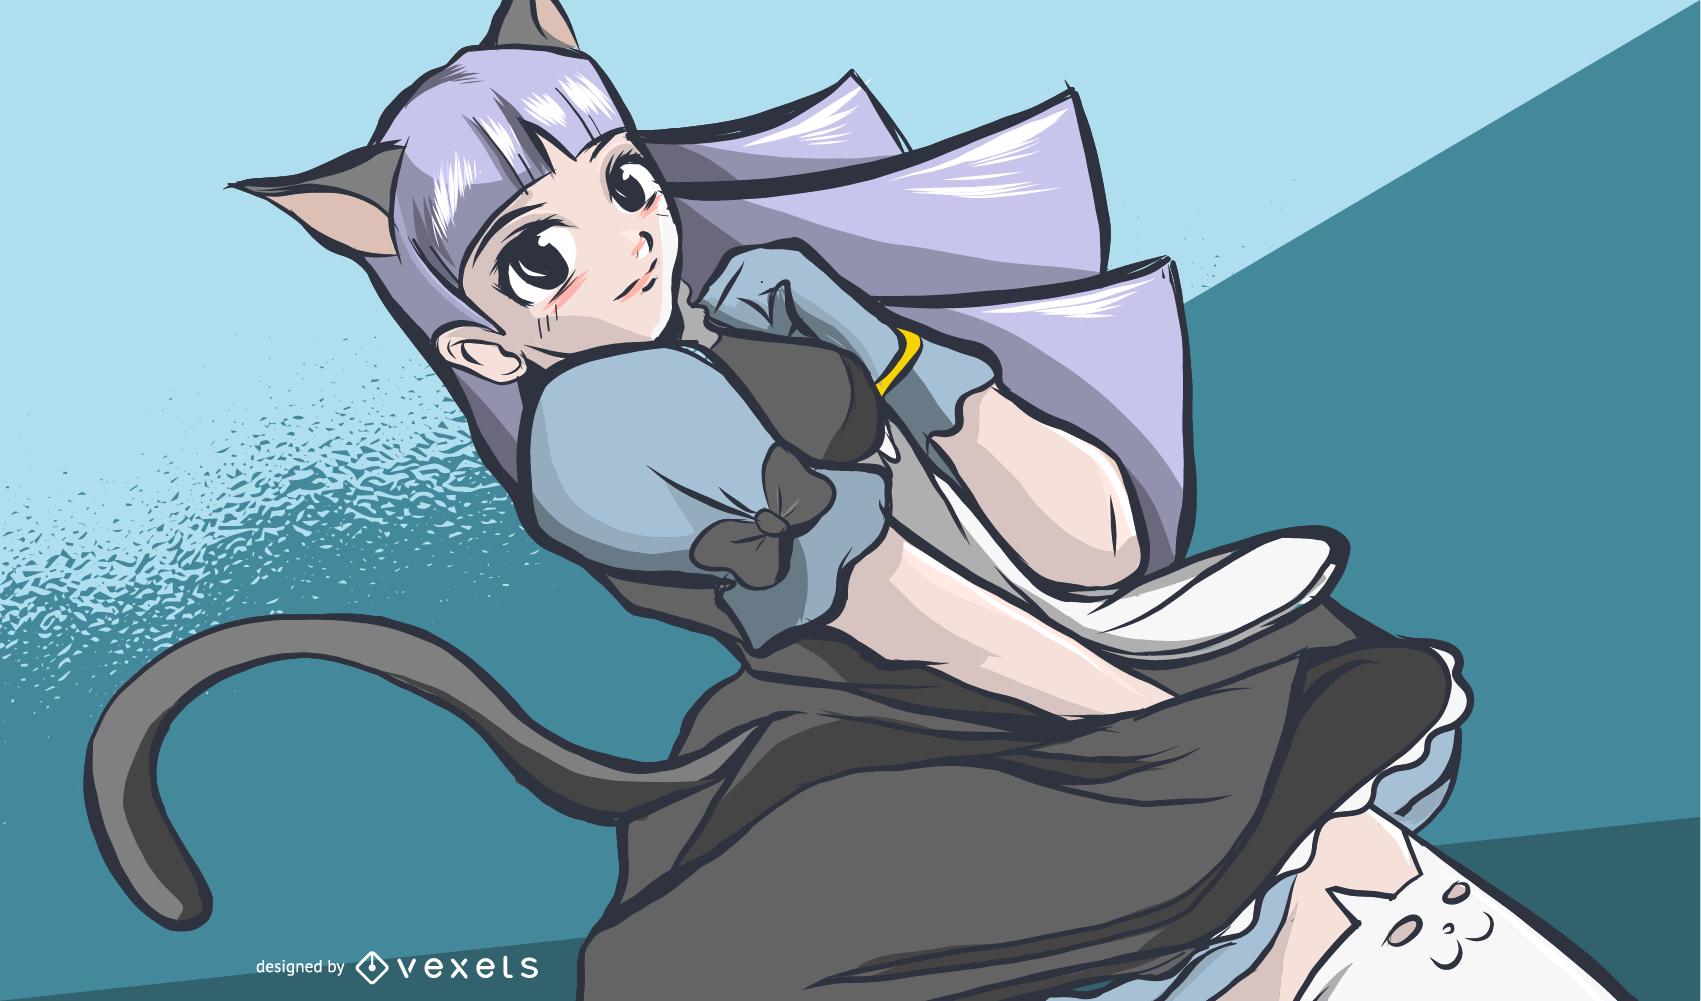 Anime Cat Maid Girl Illustration